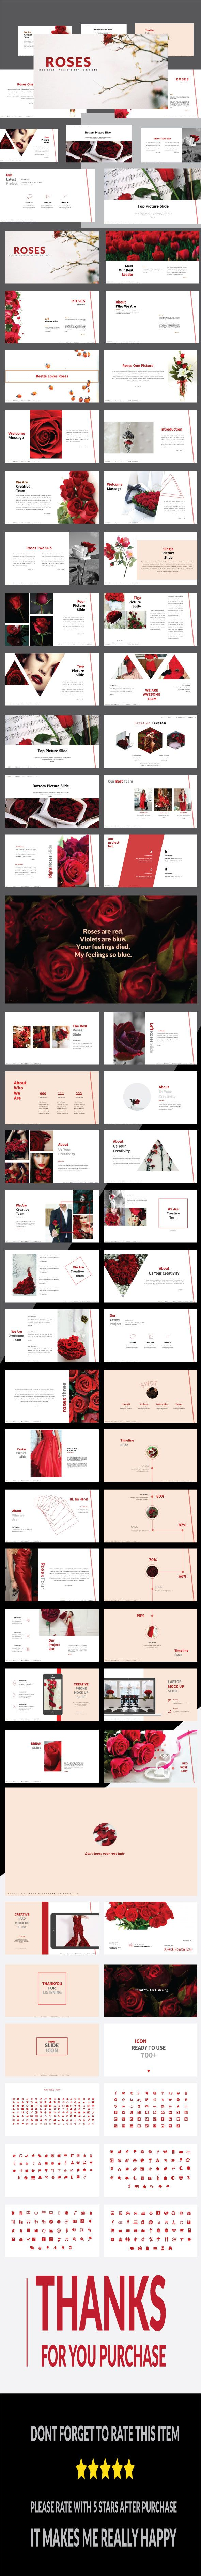 Best 25 create powerpoint presentation ideas on pinterest roses multipurpose powerpoint template toneelgroepblik Image collections